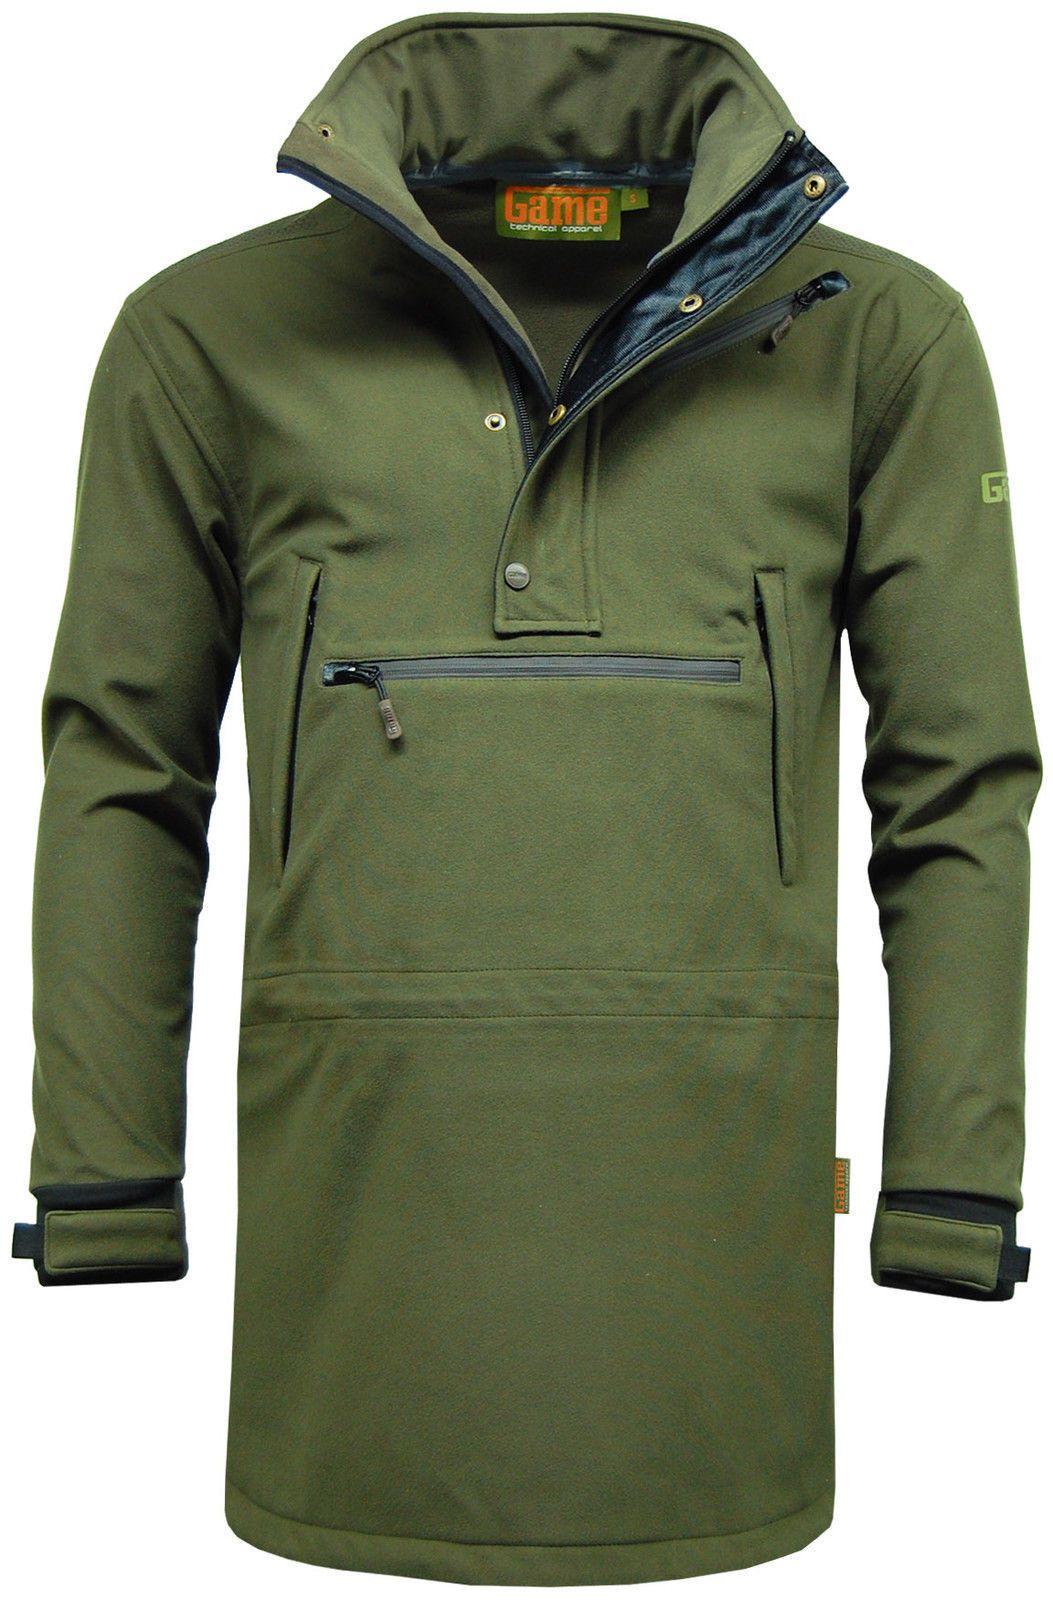 aac77cfe9b7c71 Mens Game Stalking Smock Waterproof Breathable Hunting Shooting Jacket Coat  New Hunting Jackets